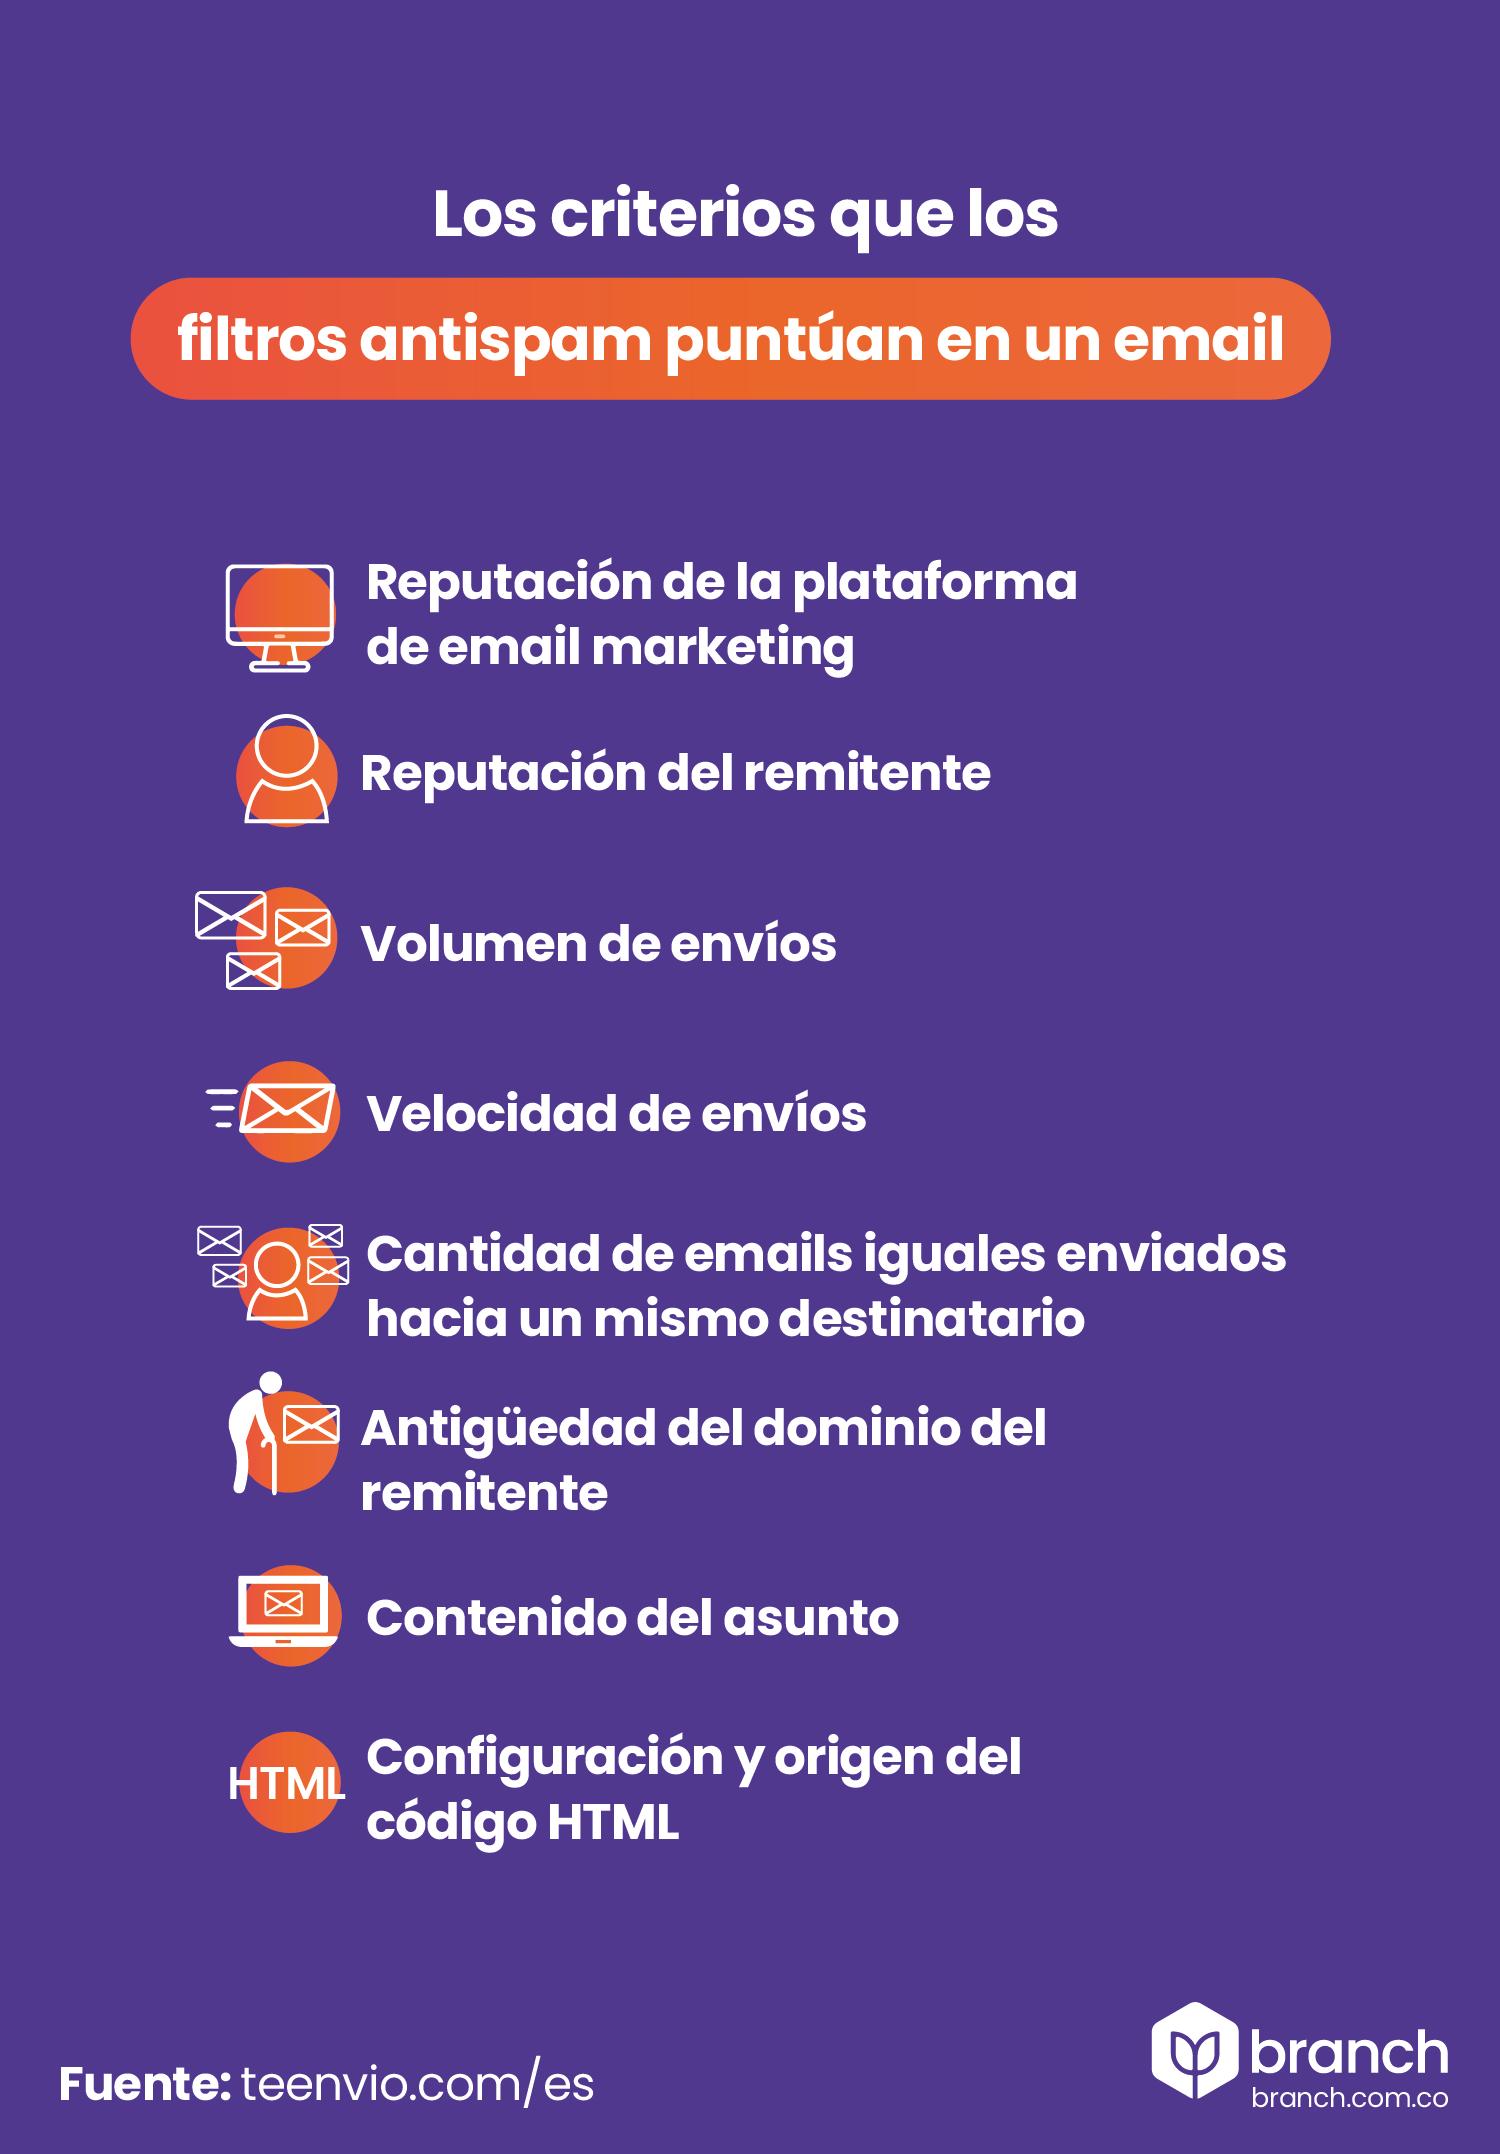 criterios-que-los-filtros-anti-spam-usan-para-puntuar-emails